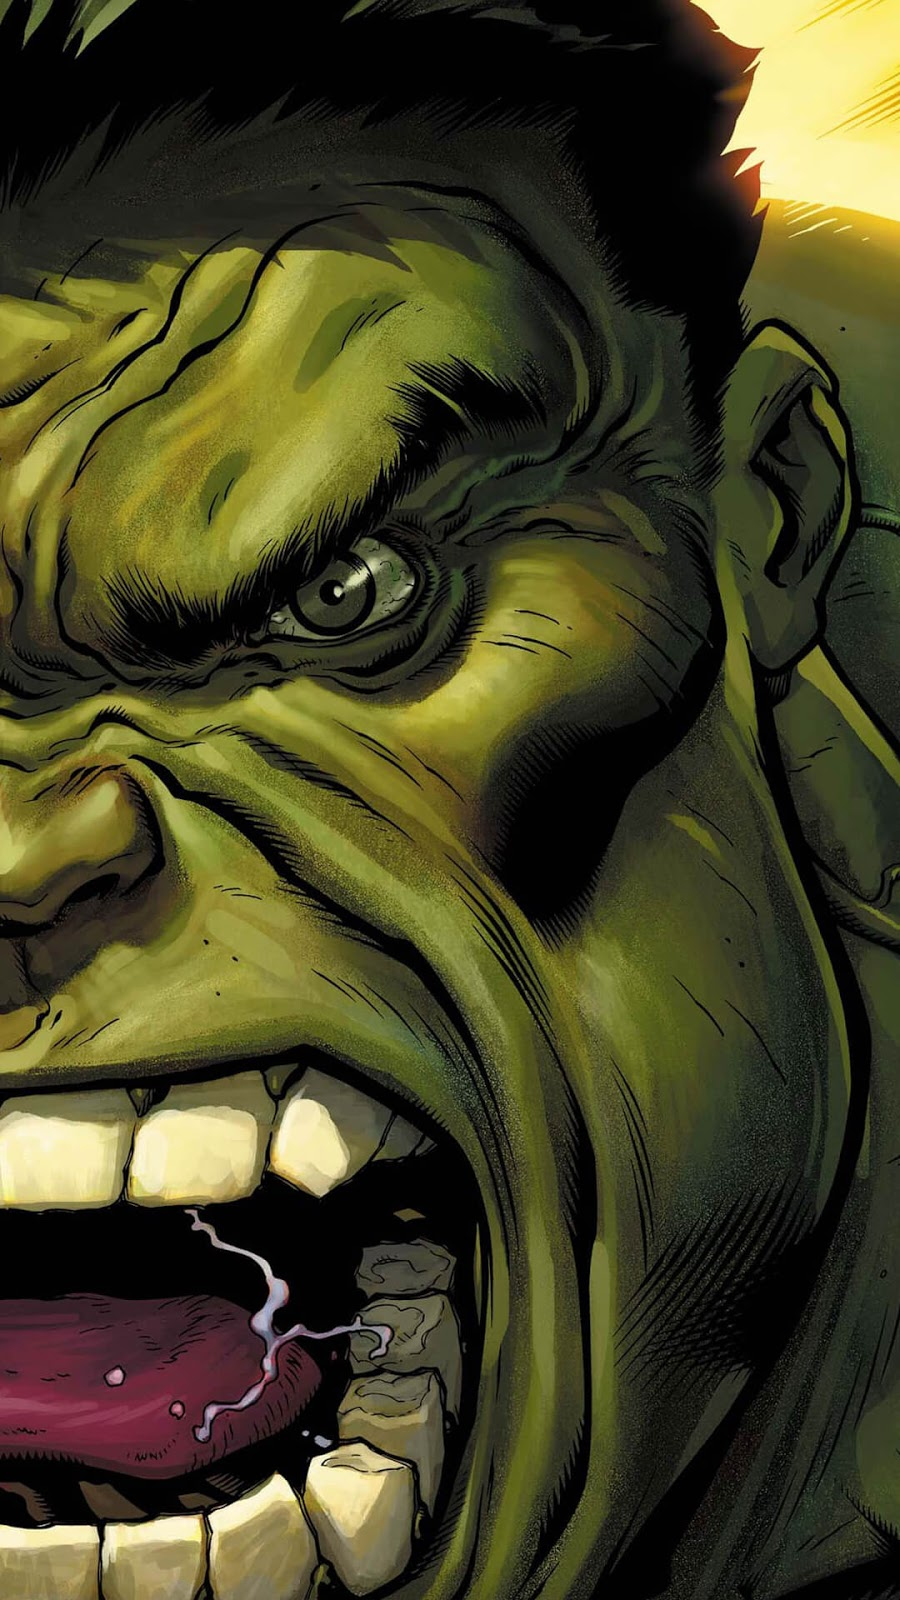 hulk wallpaper download in 4k high resolution